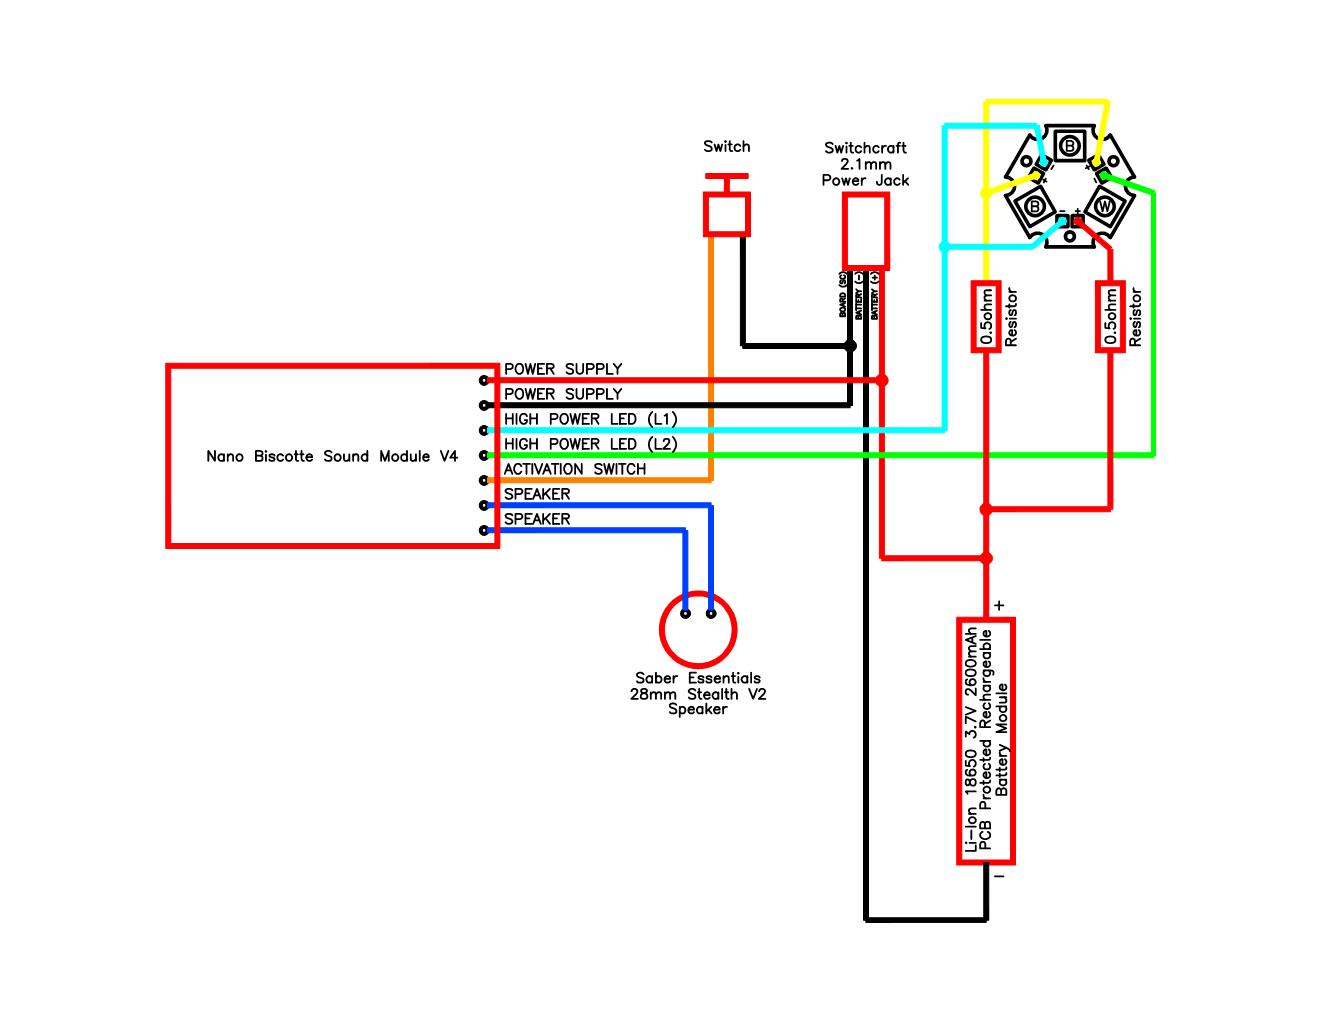 hight resolution of lightsaber wiring diagram electrical schematic wiring diagram lightsaber wiring diagram